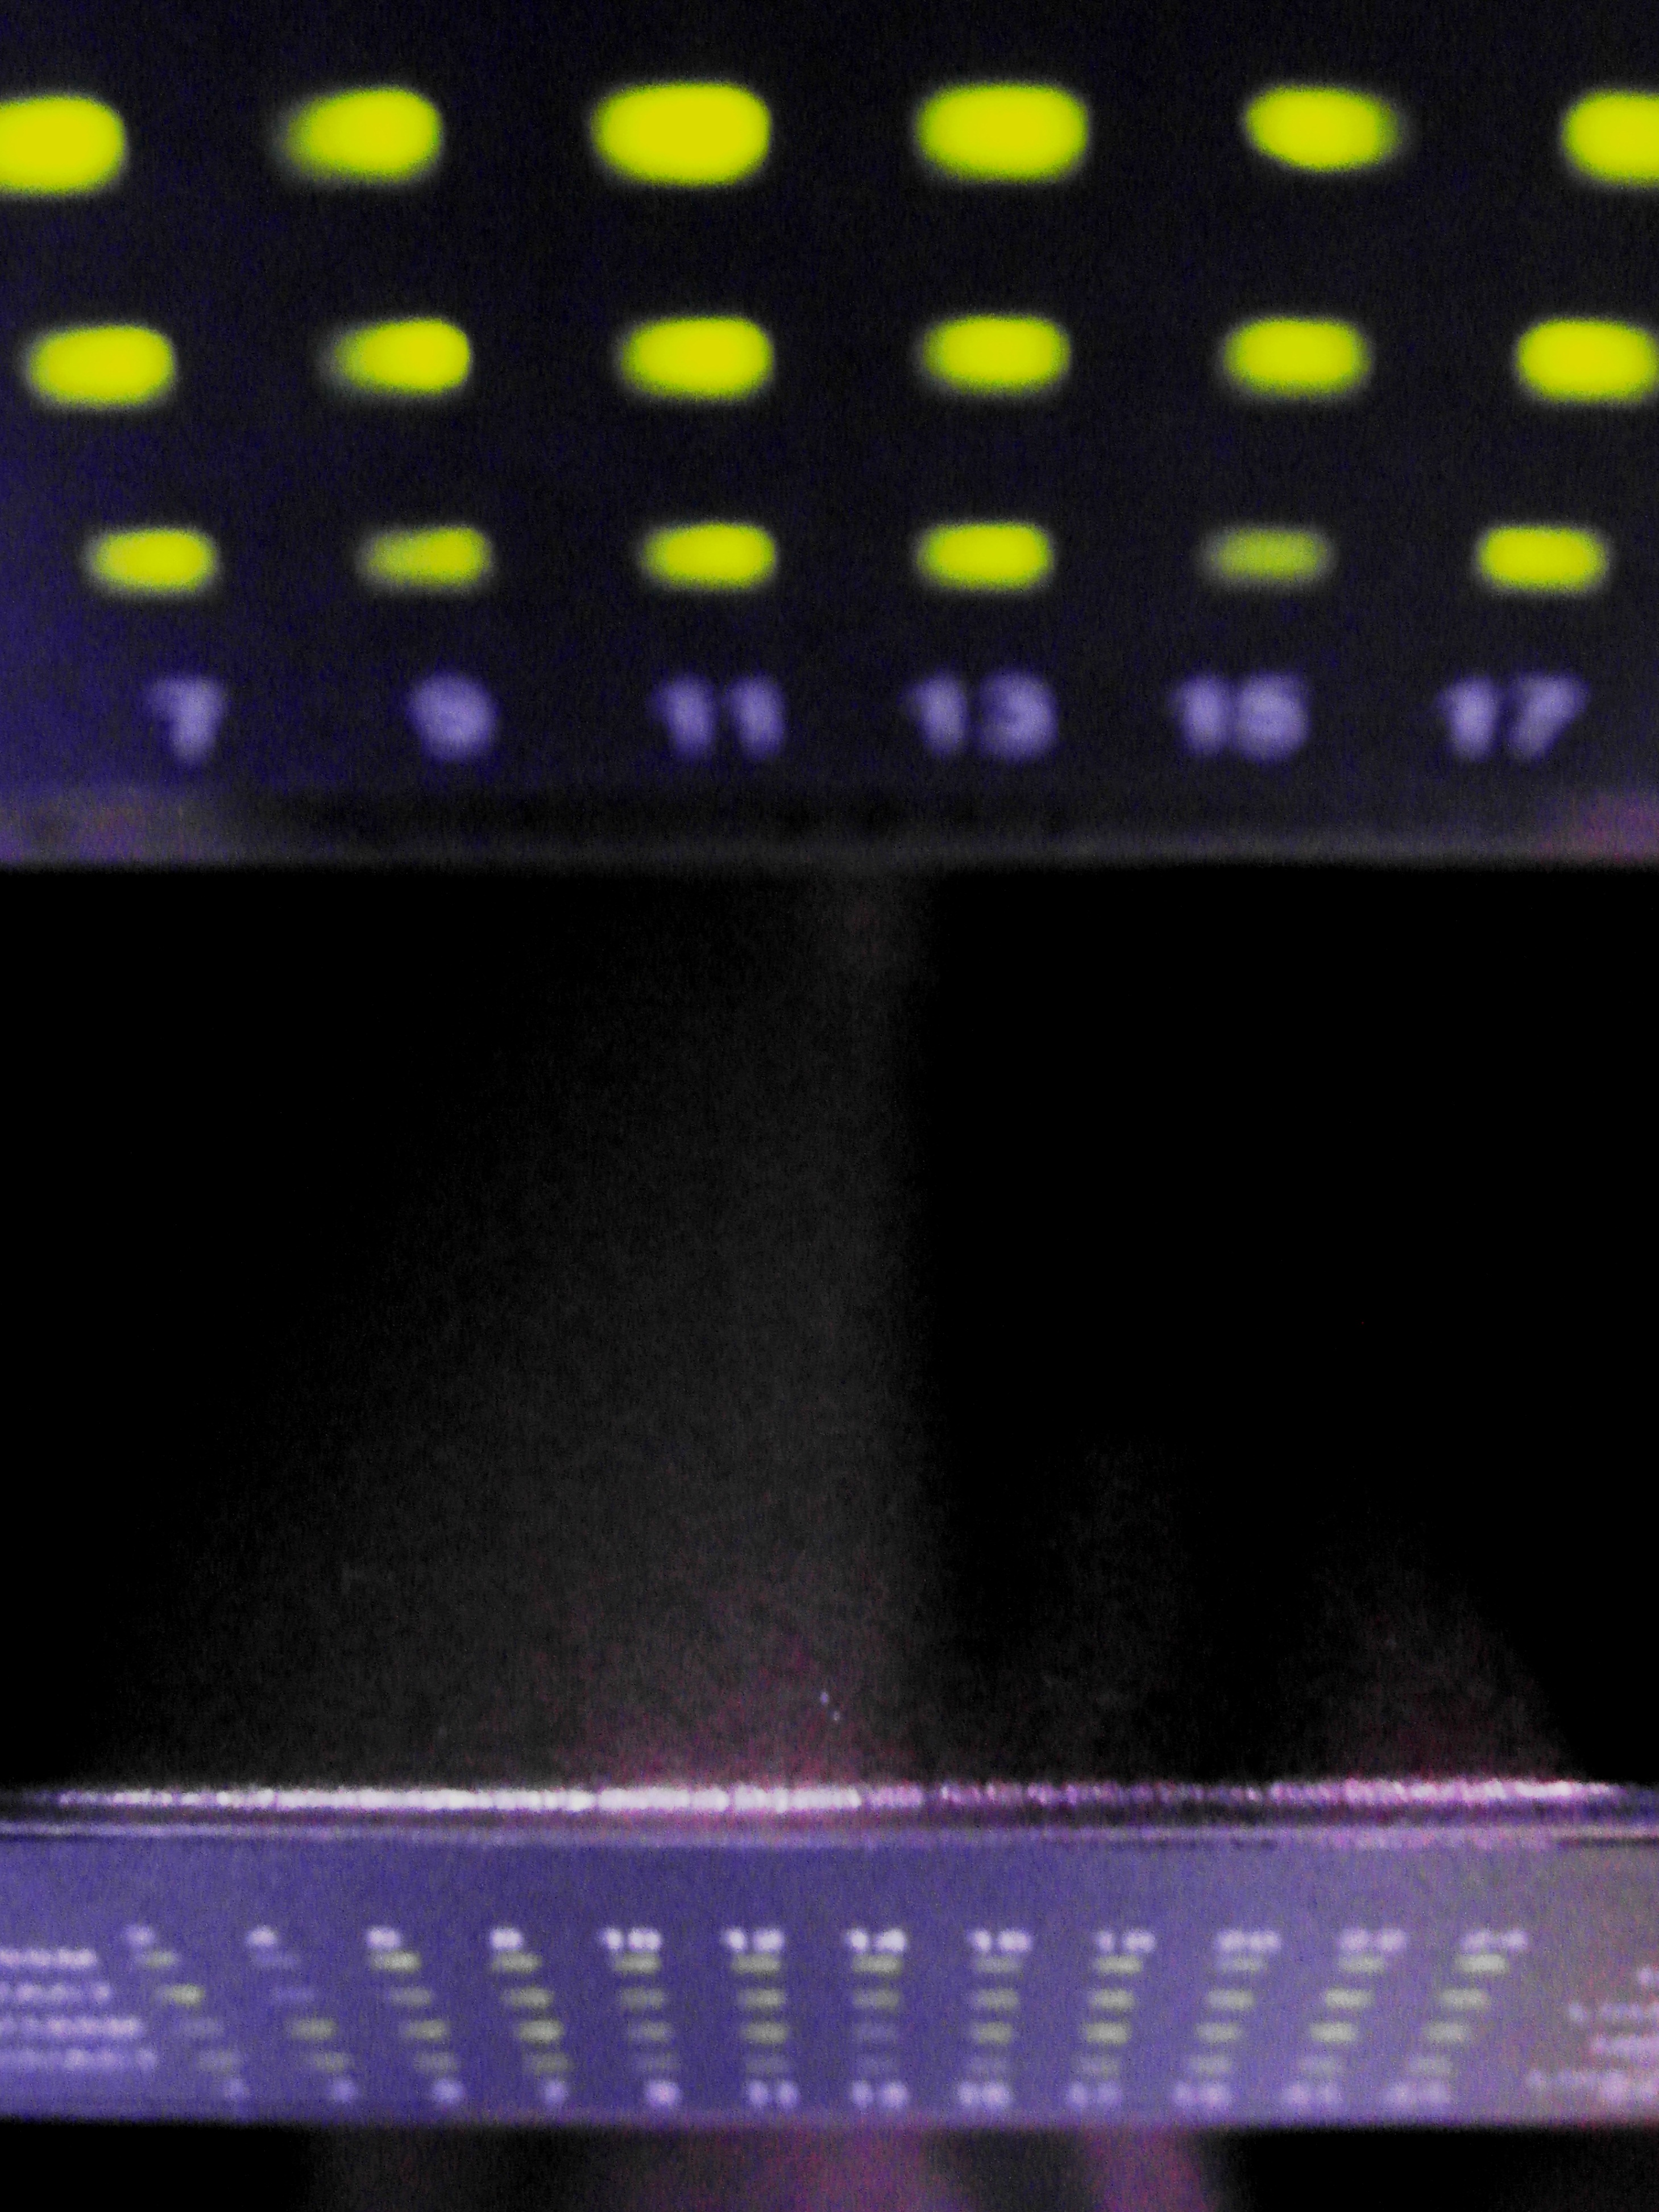 Free photo: Server Network Lights - receiver, room, rack - Non ...